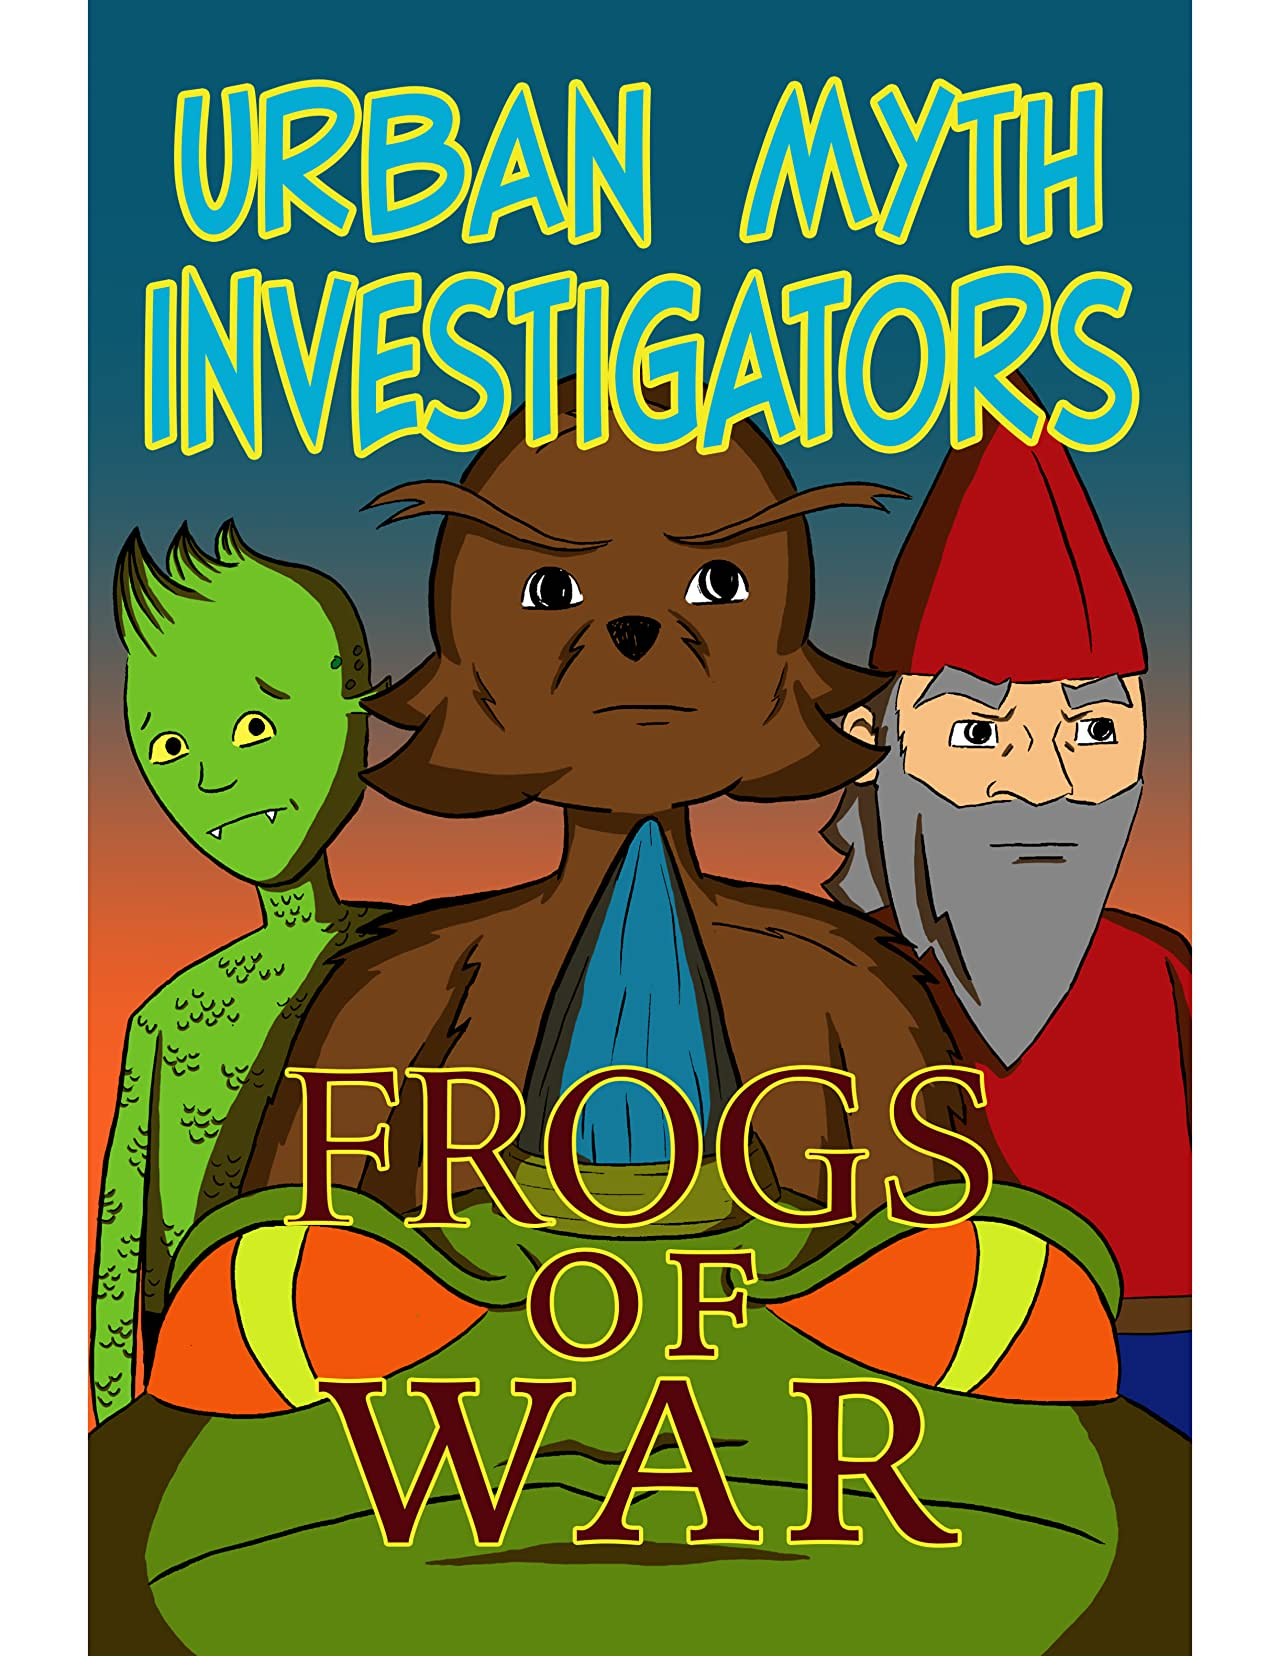 Urban Myth Investigators: Frogs of War